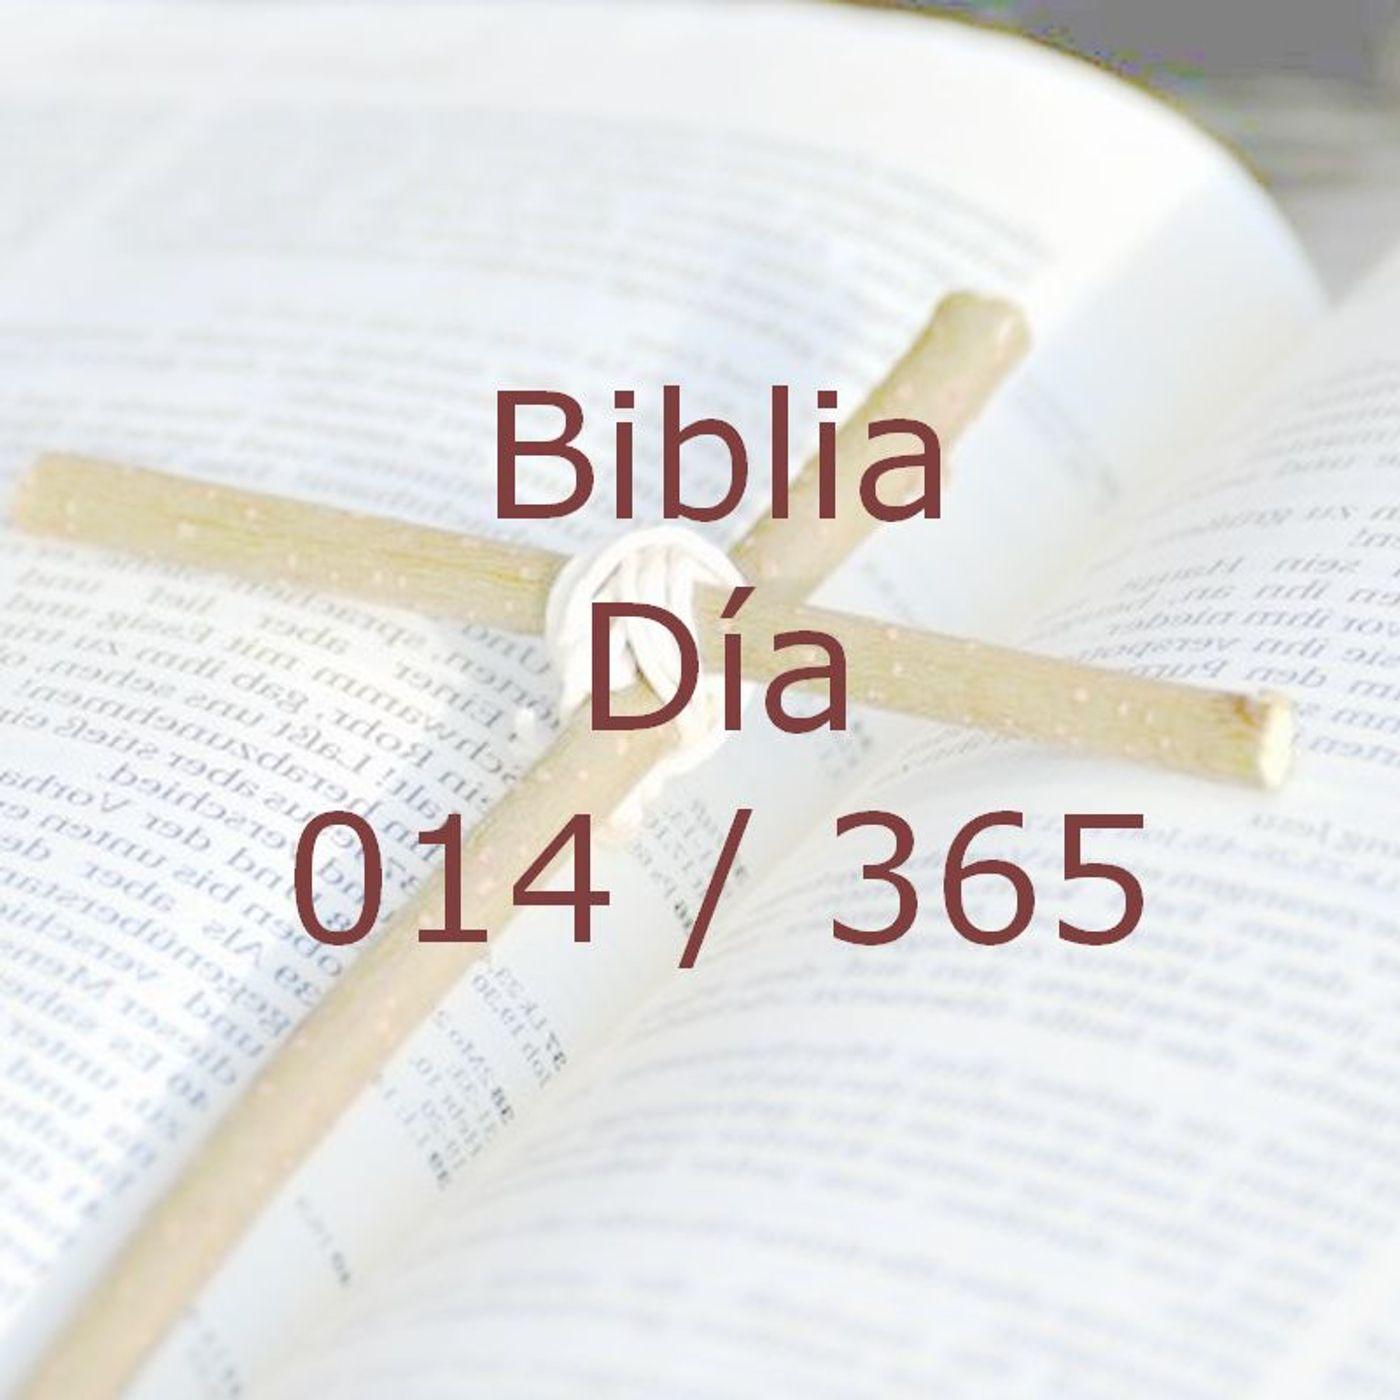 365 dias para la Biblia - Dia 014